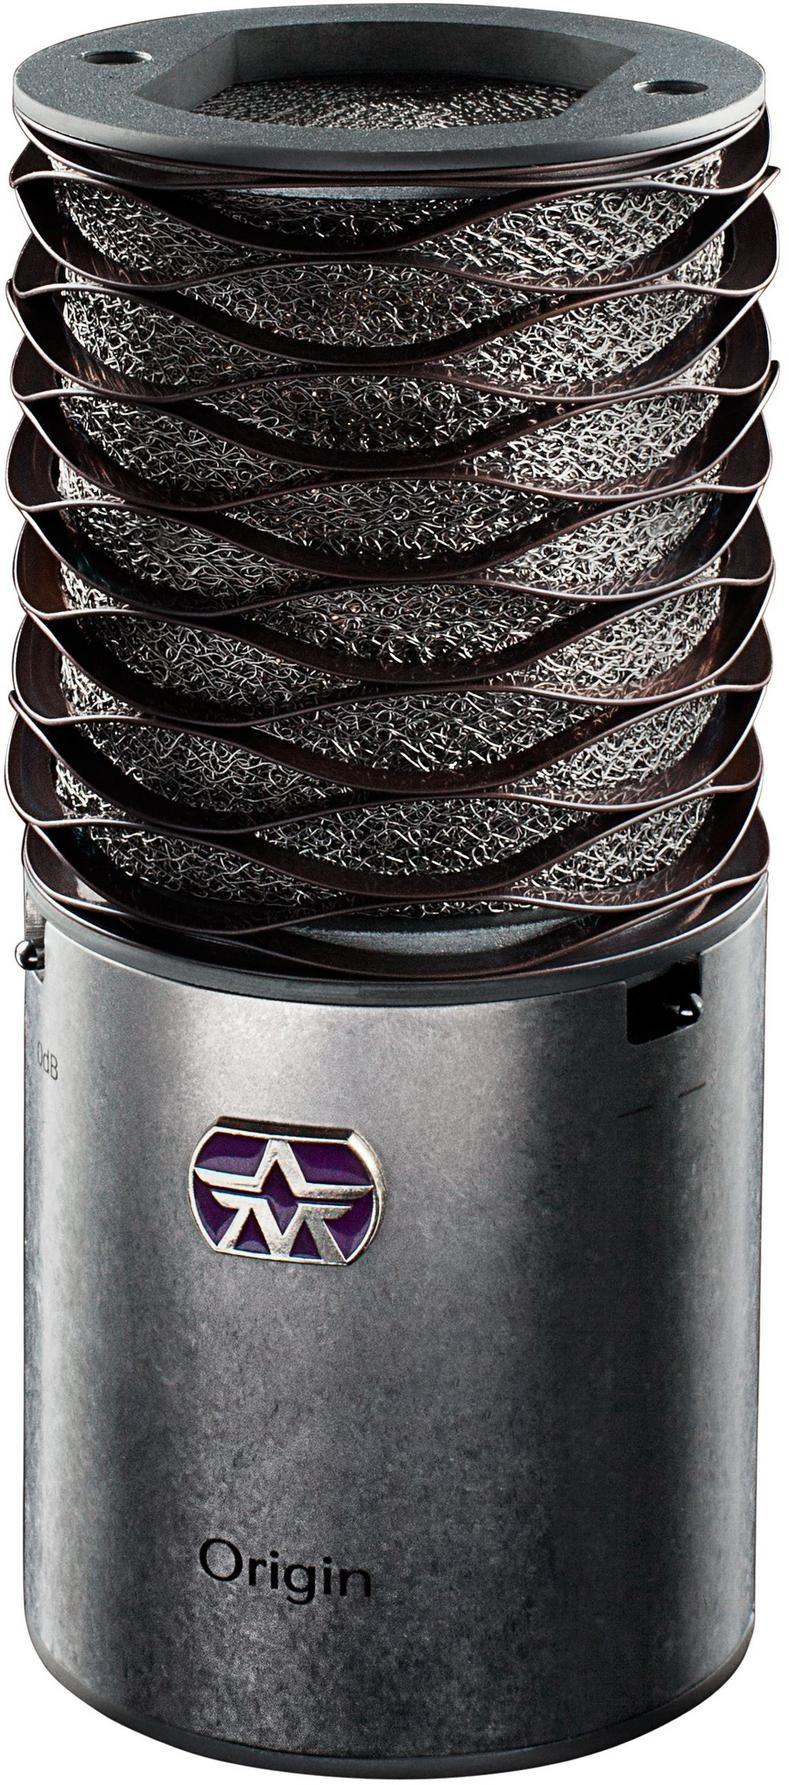 Aston Microphones Origin Kondensator Mikrofon Stormembran